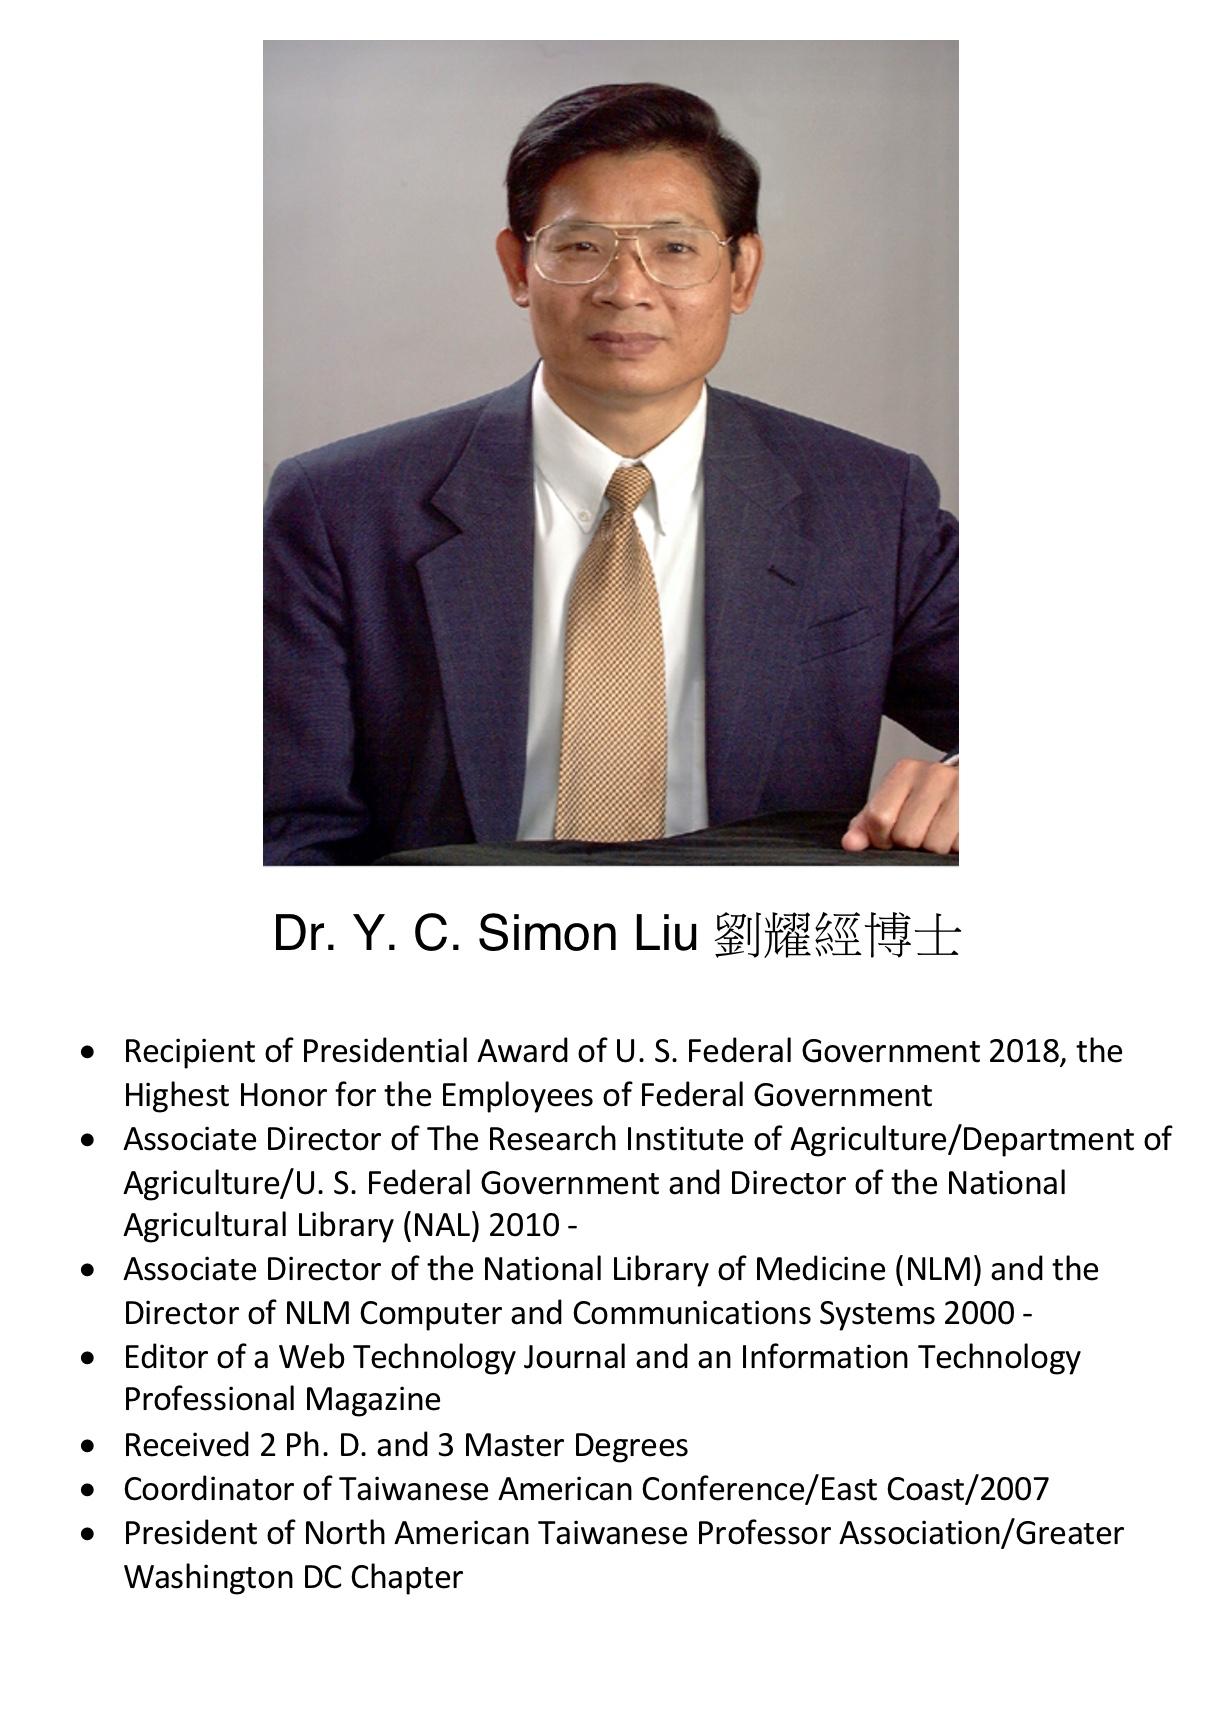 250. Dr. Y. C. Simon Liu 劉耀經博士